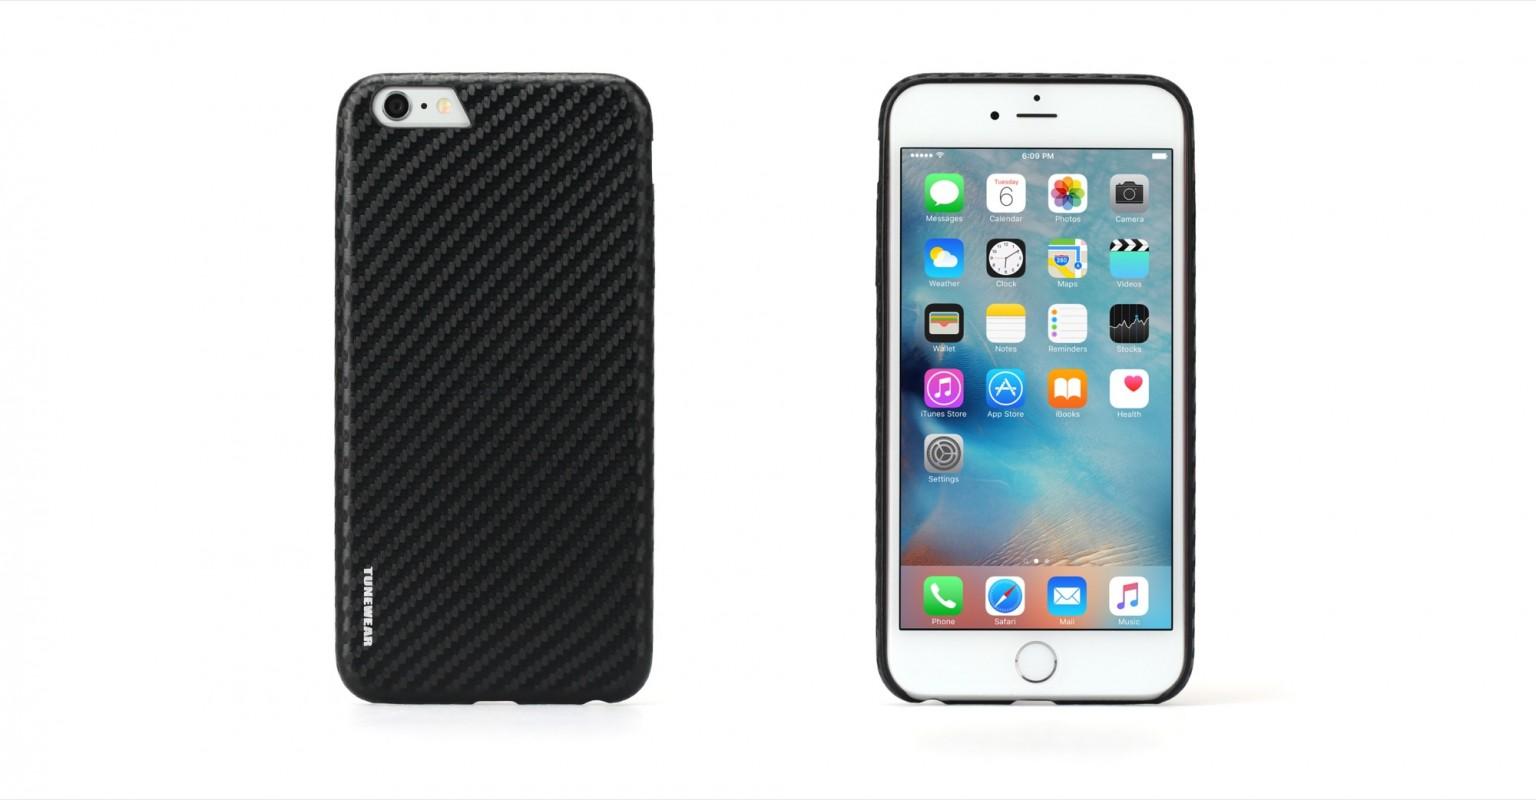 carbonlook for iphone 6s plus 6 plus tunewear